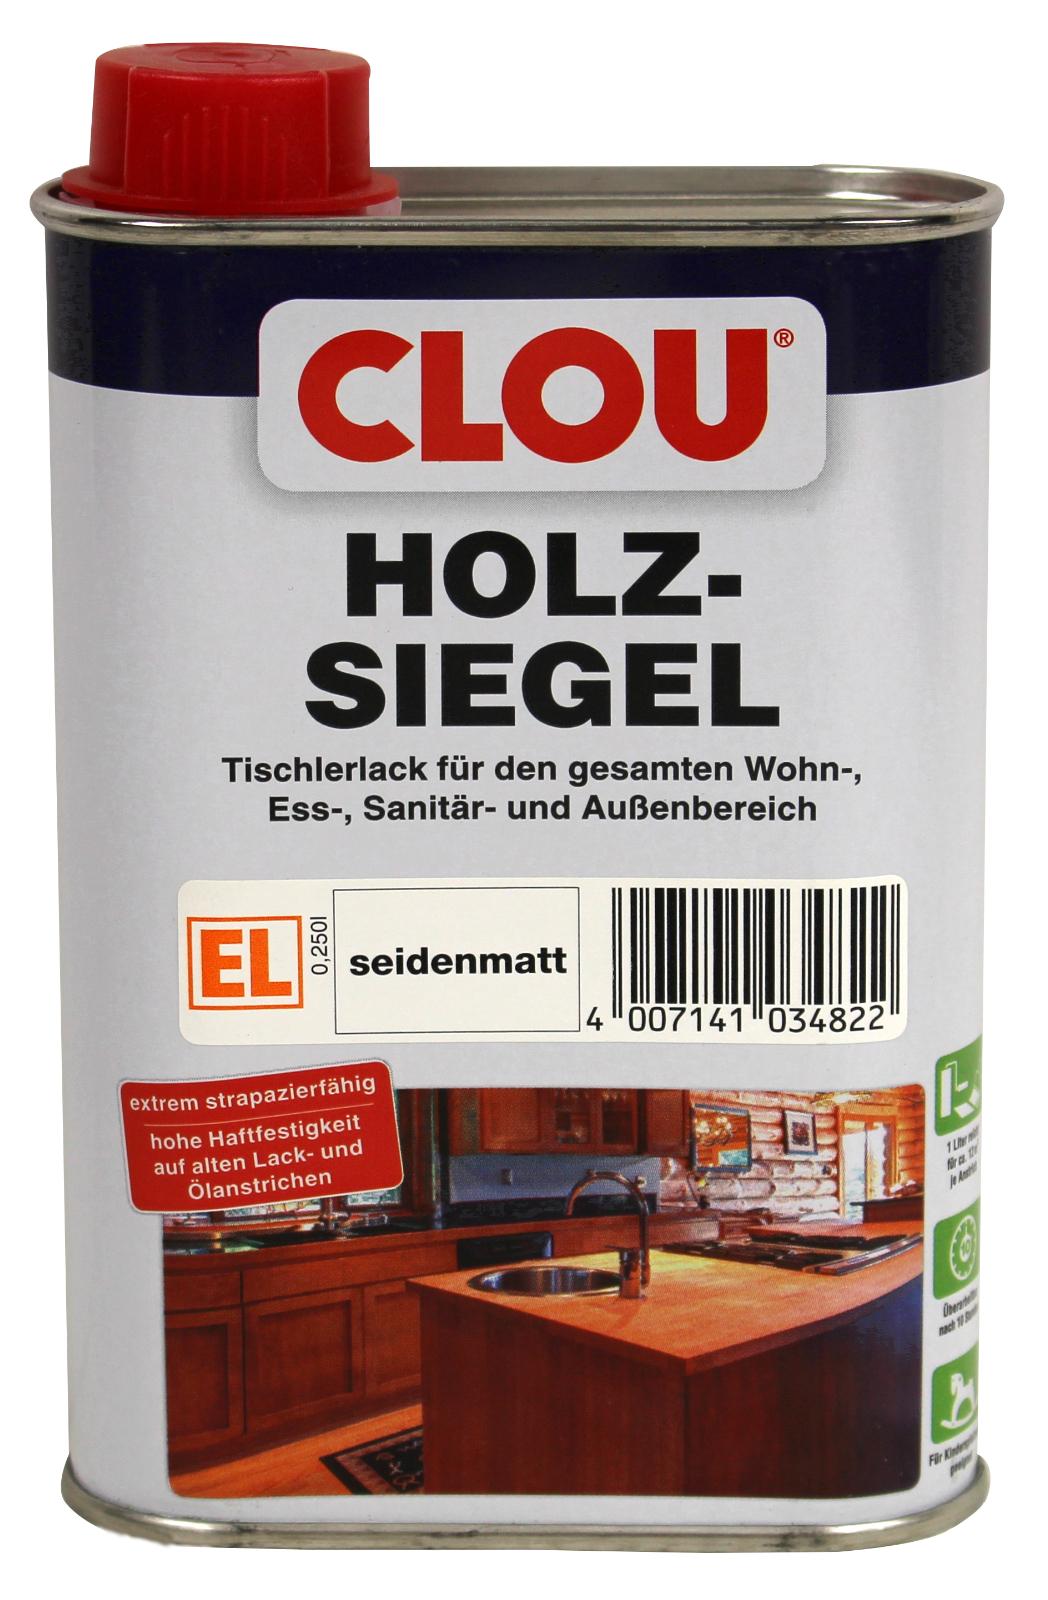 holzsiegel clou universal klarlack seidenmatt 250 ml | ebay